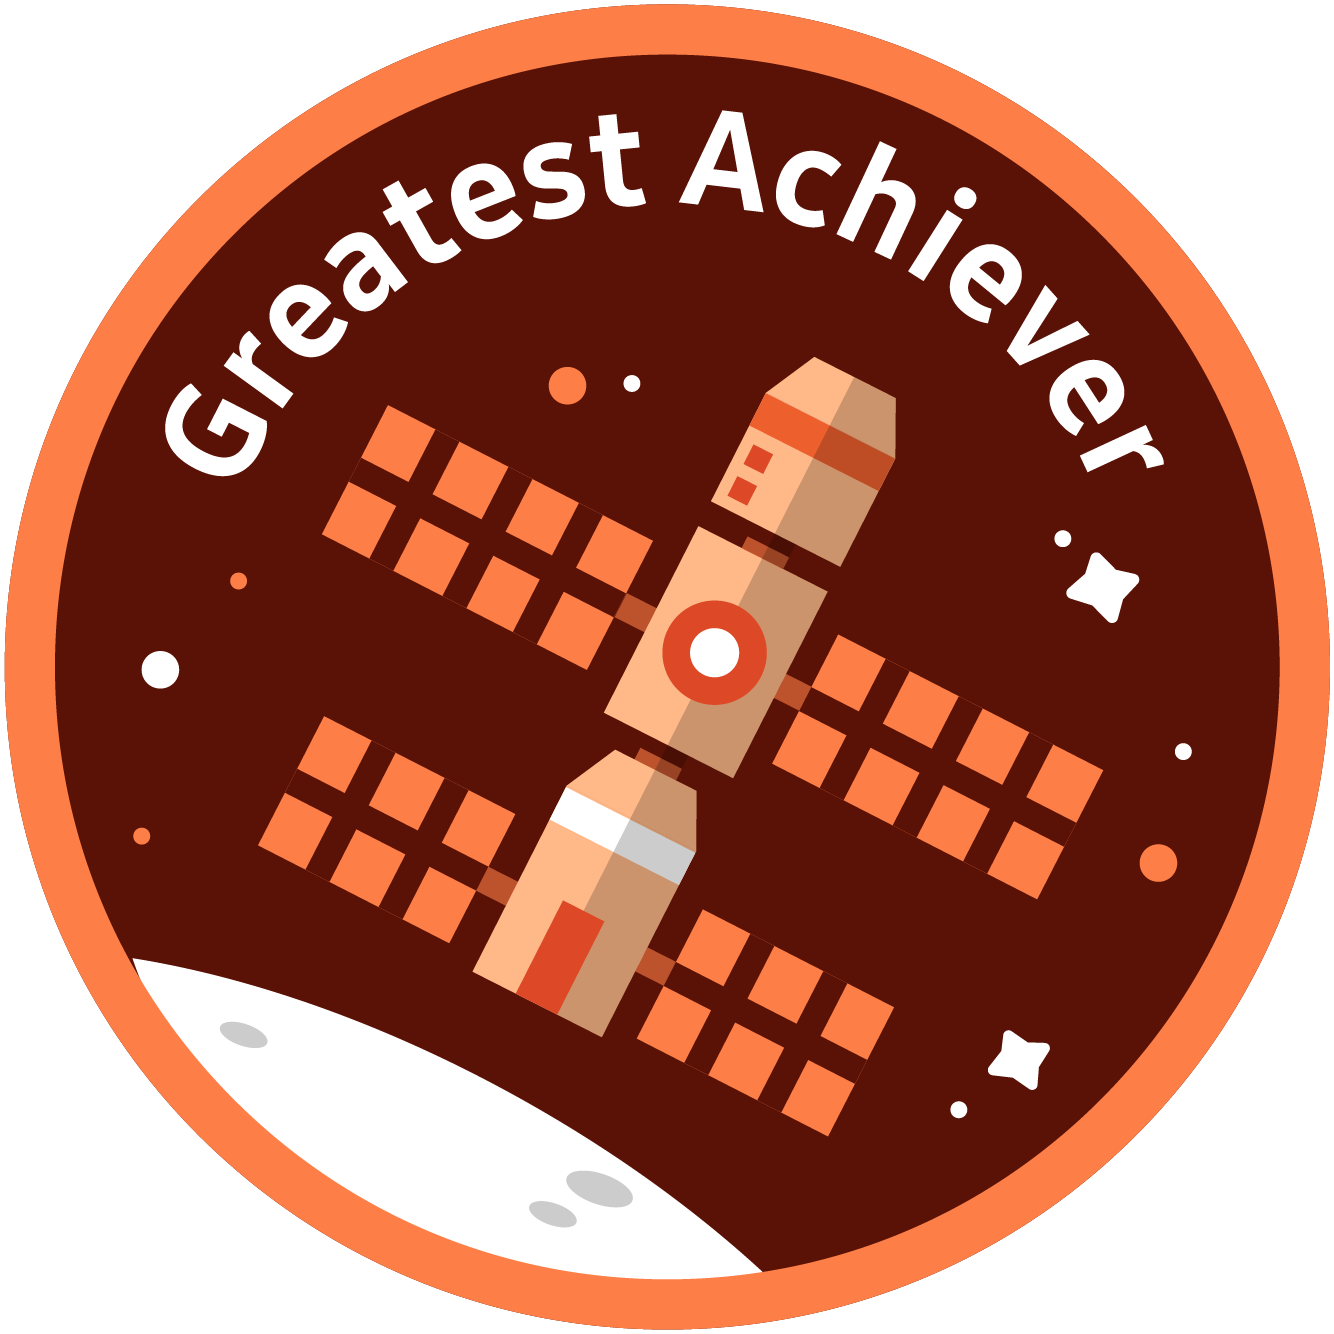 Greatest Achiever